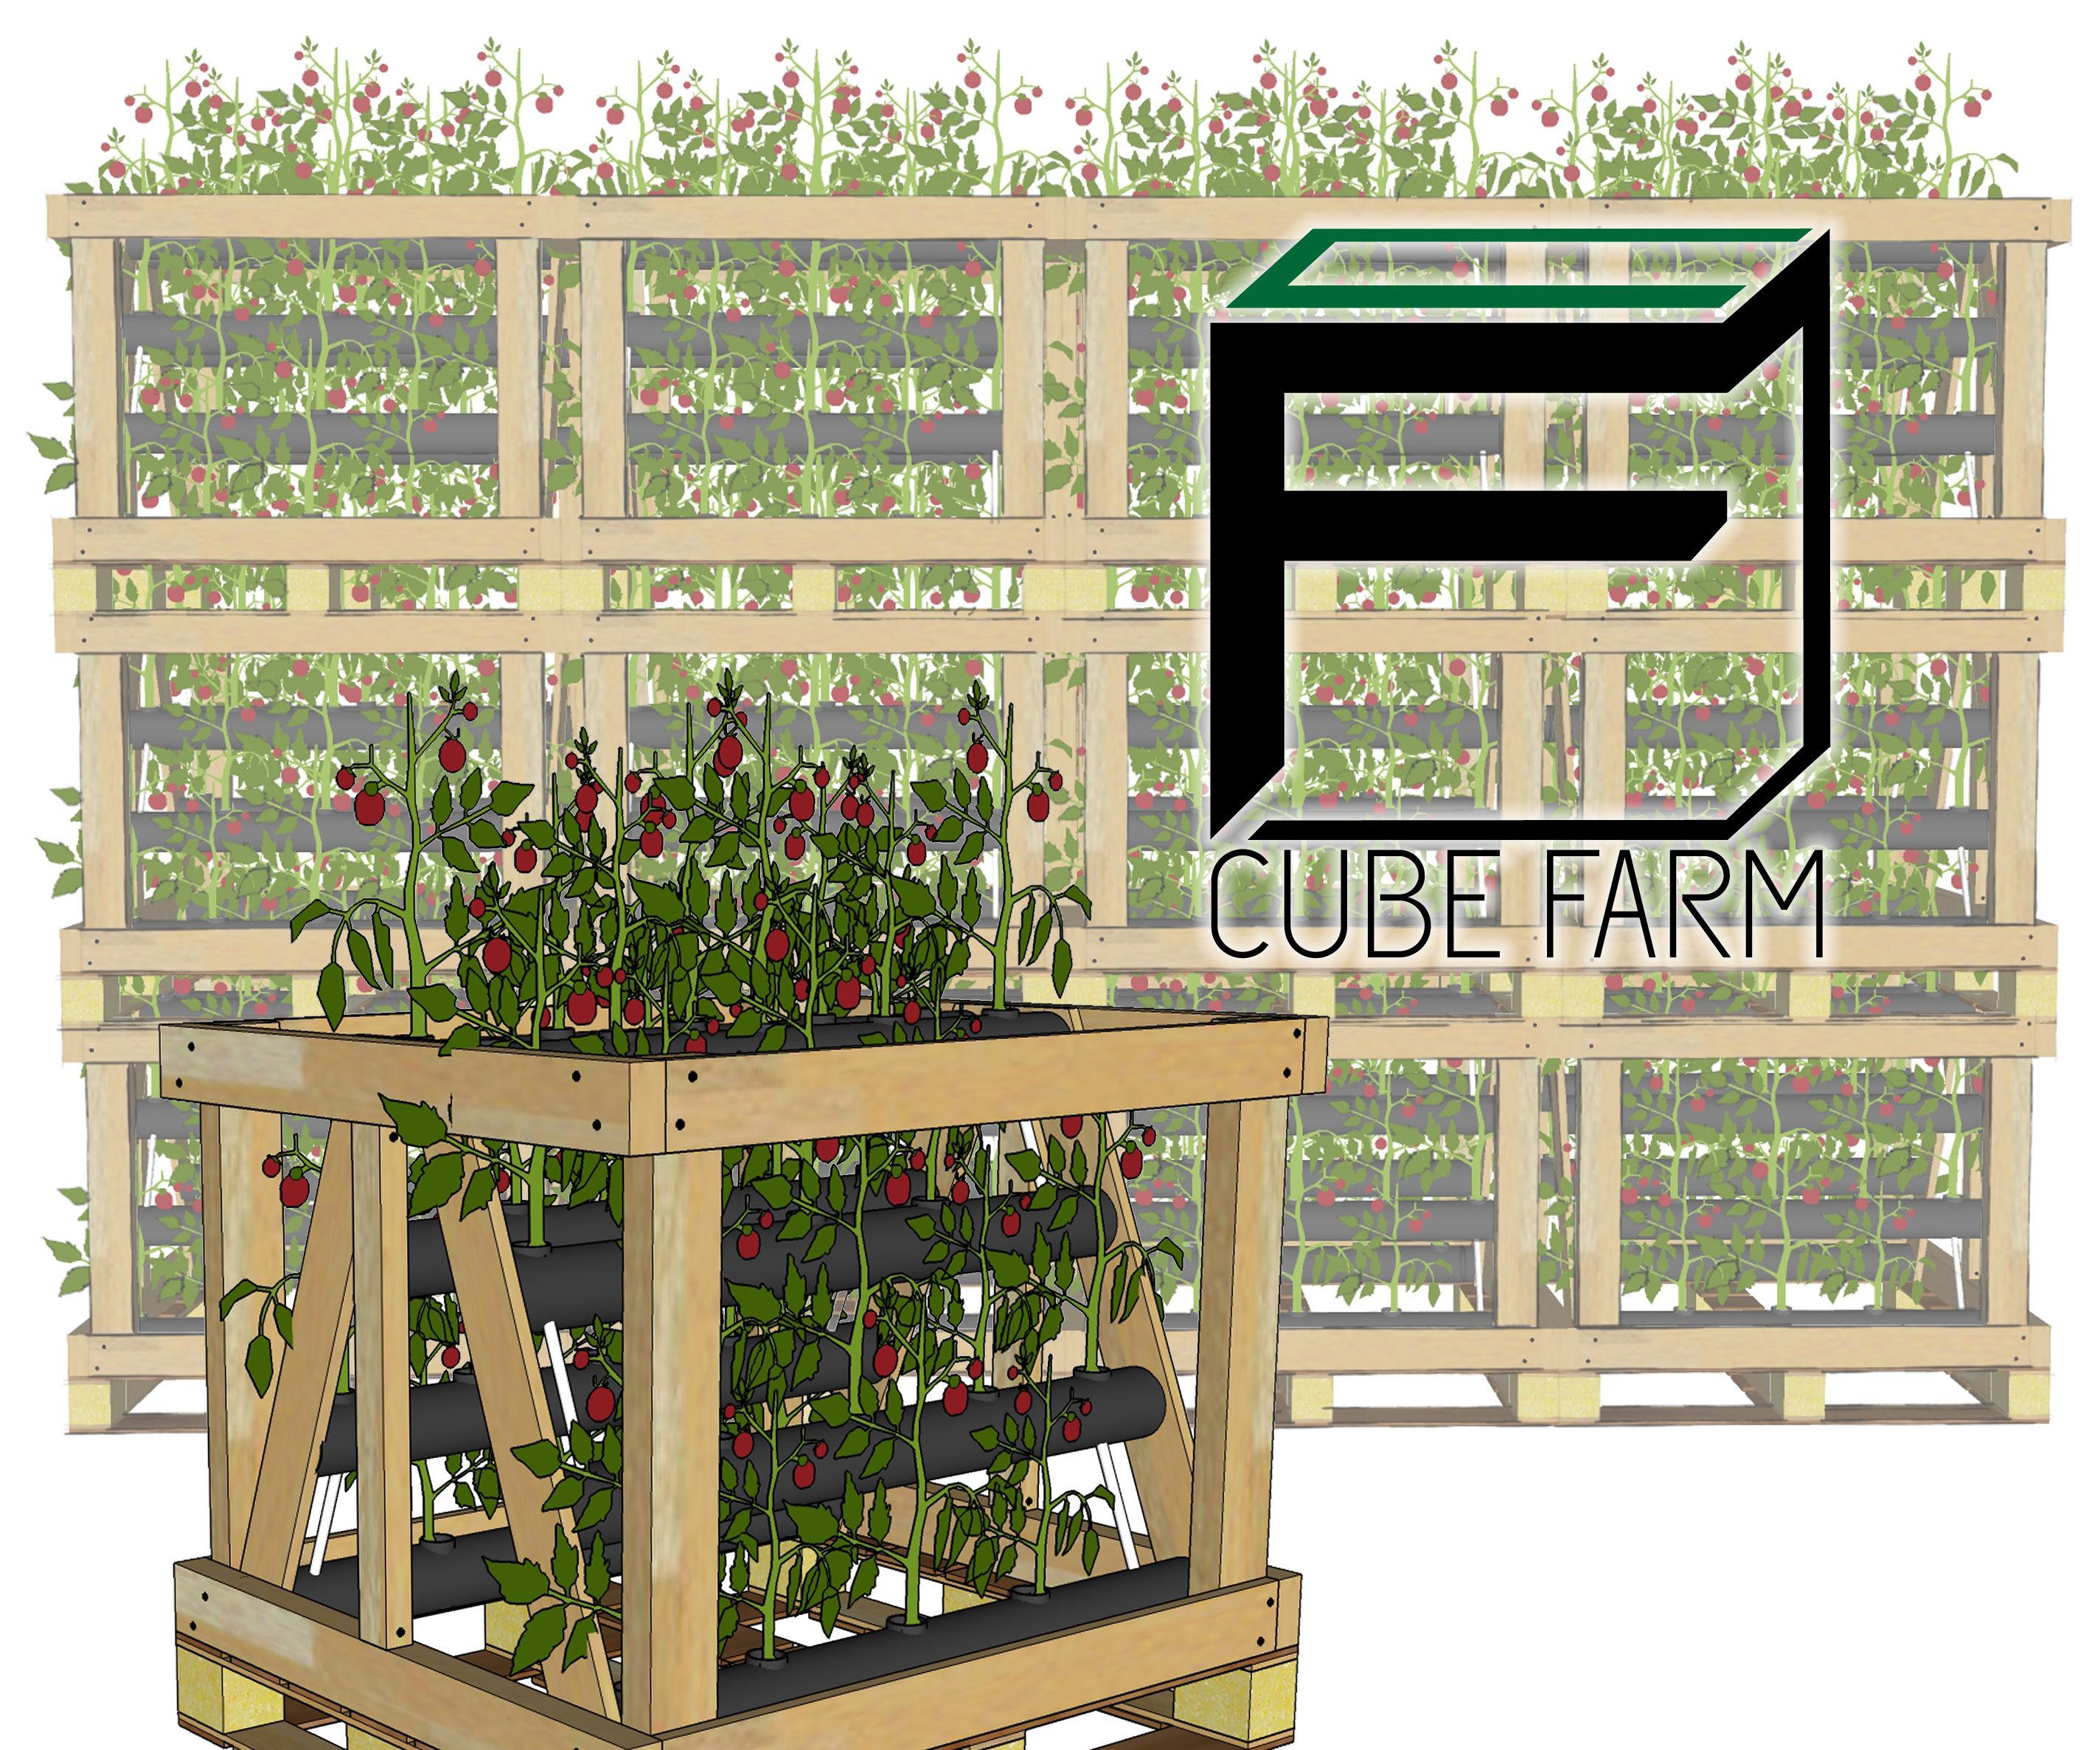 Cube Farm : a Modular, Open Source, Agriculture Platform